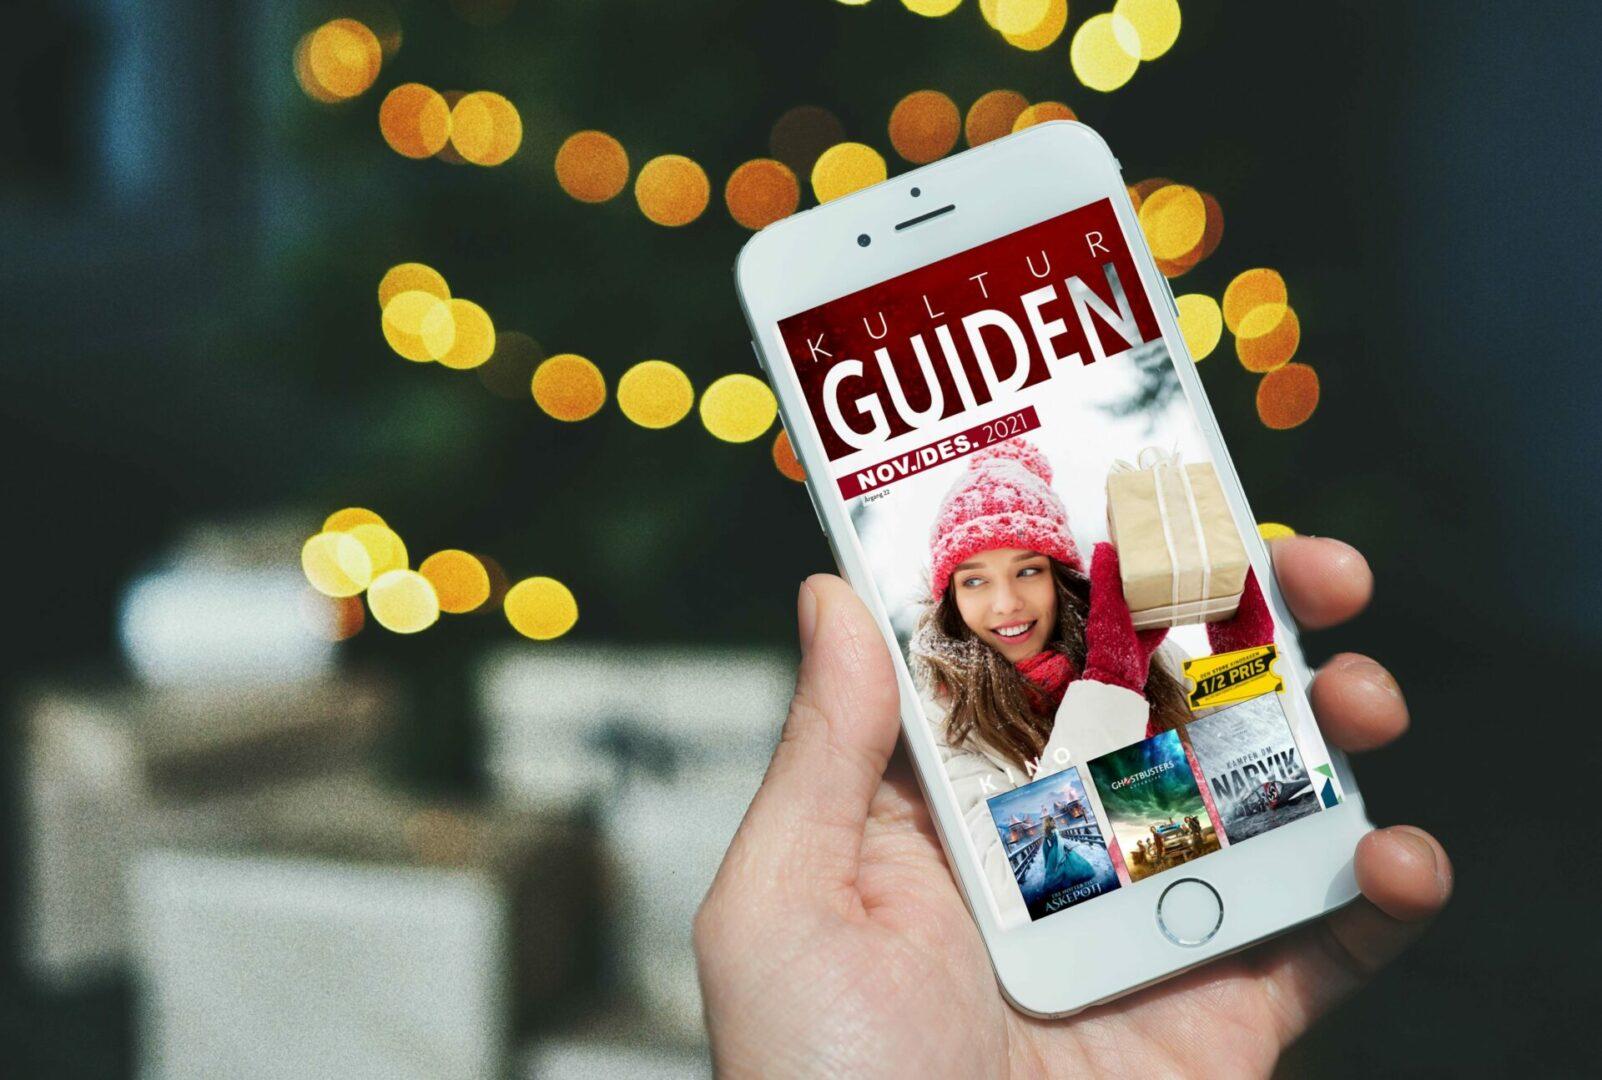 Kulturguiden på mobilen foran juletreet